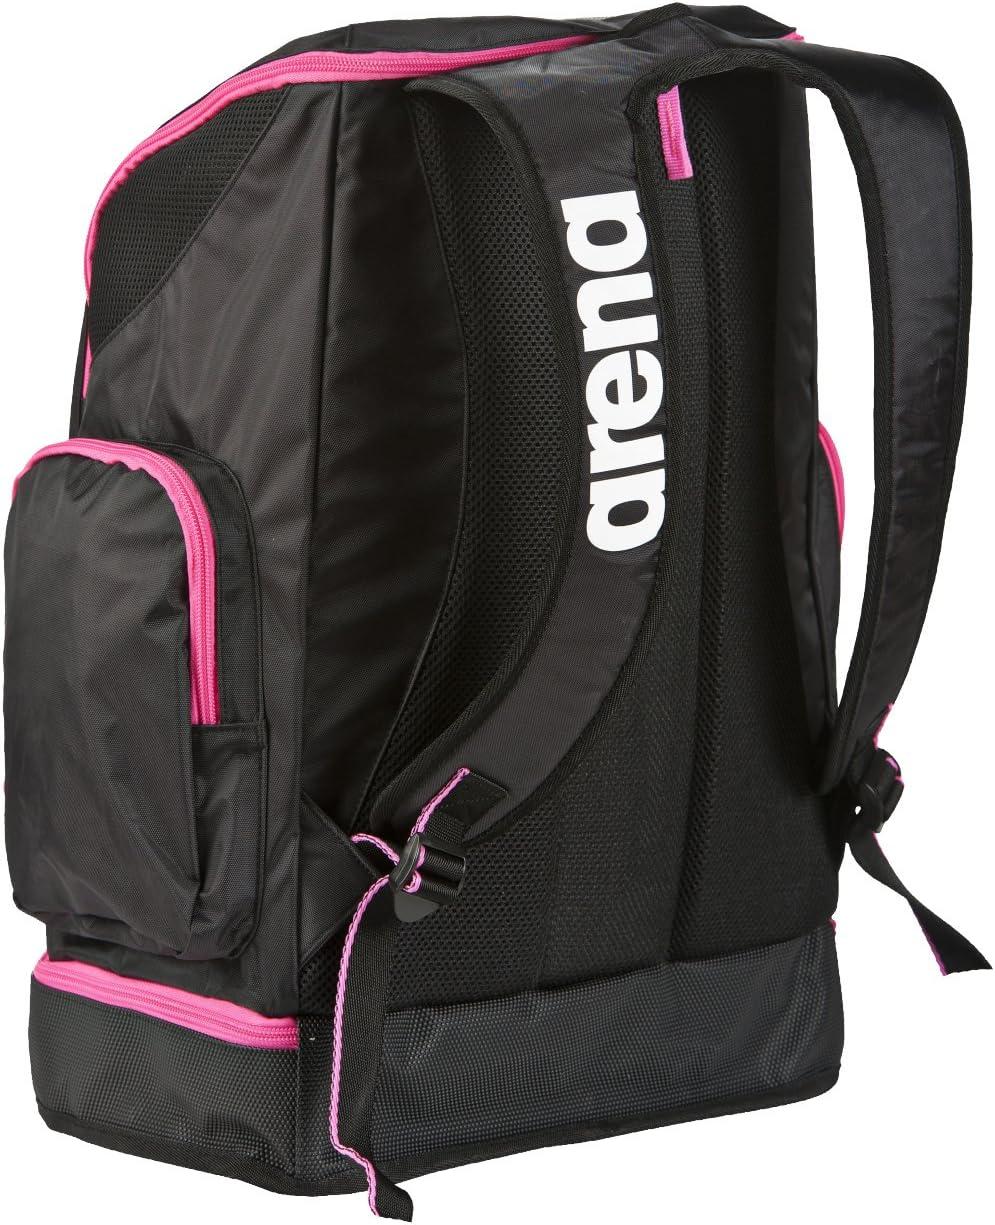 Arena Spiky 2 Medium Holdall Swimming Pool Swimwear Gear /& Equipment Bag Carrier